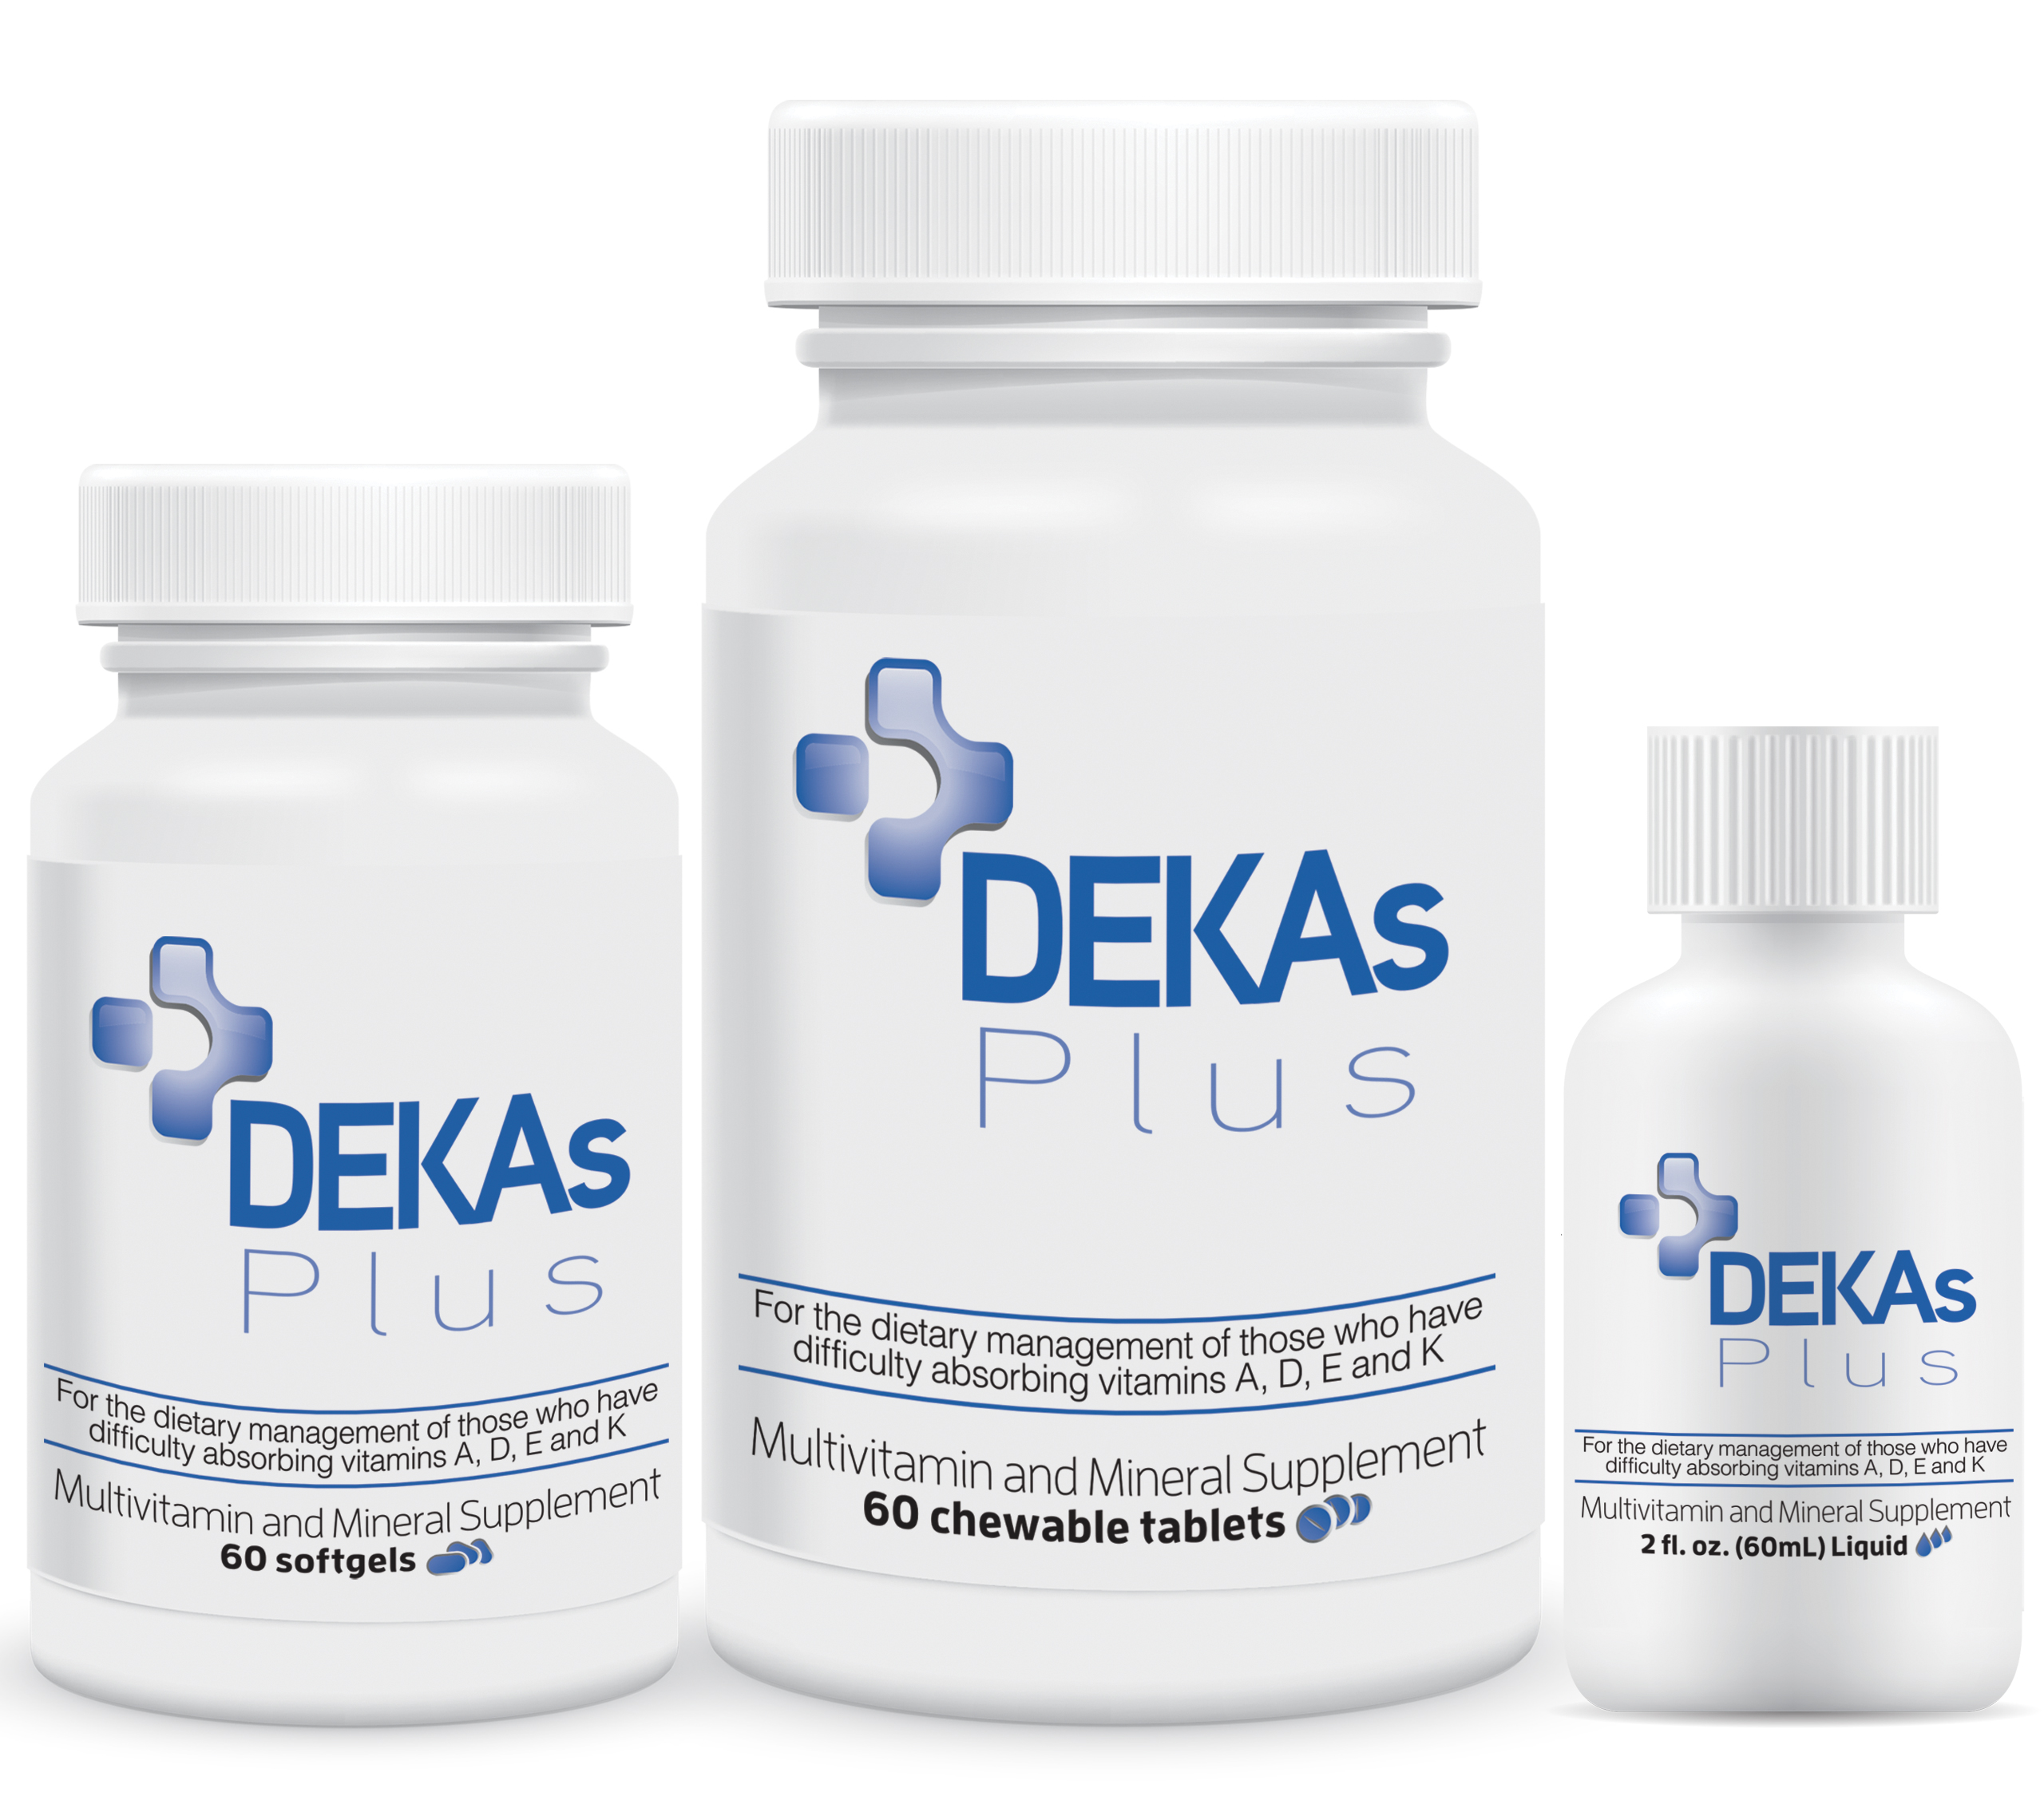 DEKAs - replaces AquADEKs